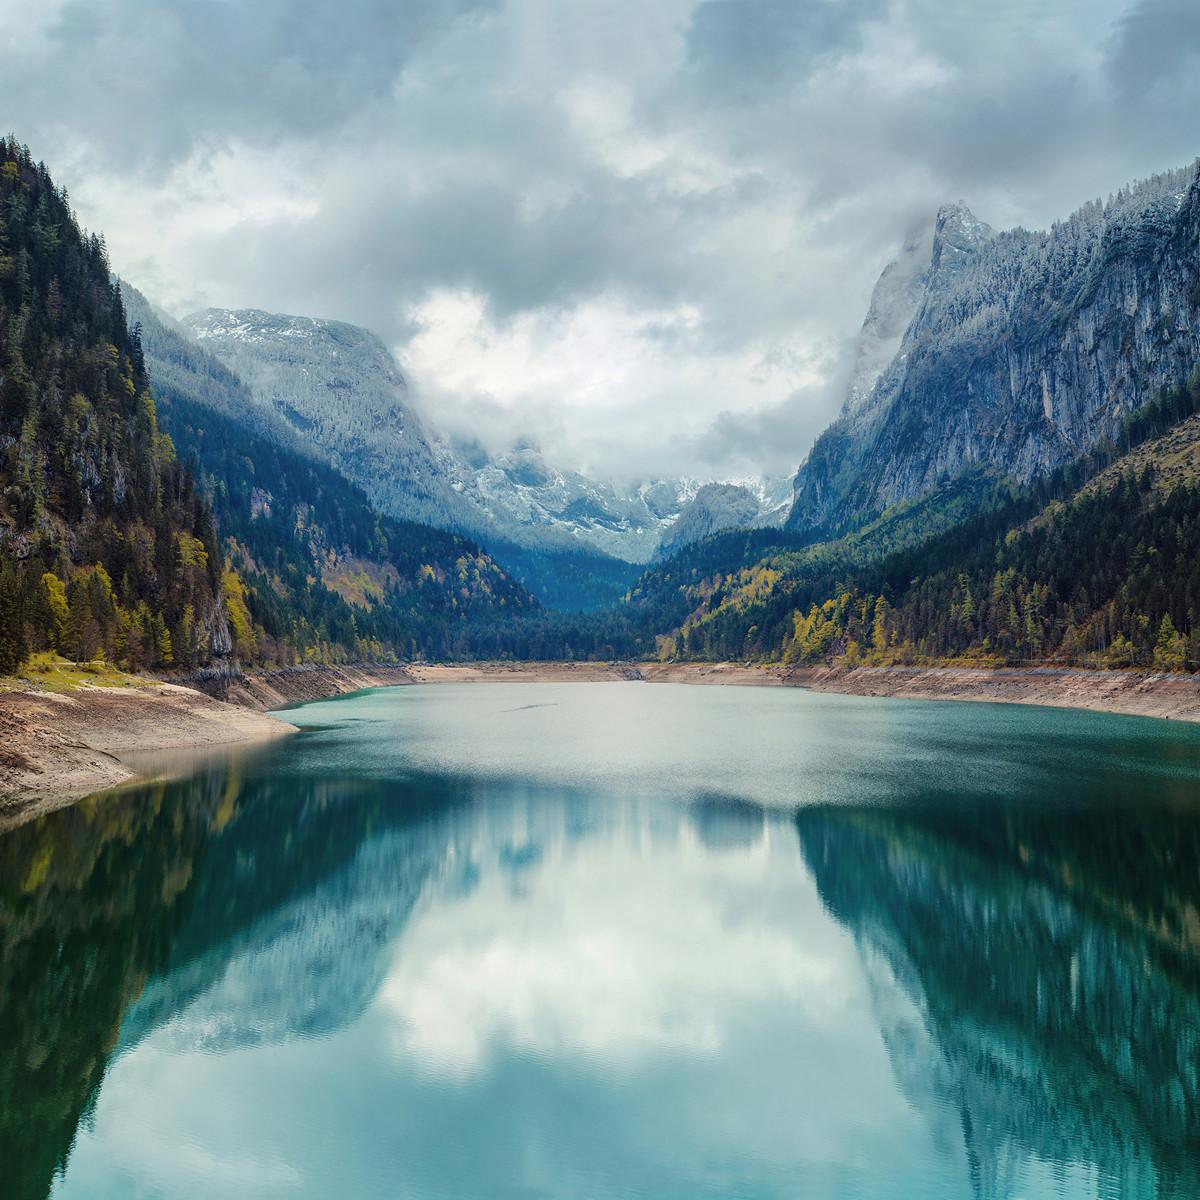 Alpine lake with dramatic sky and mountains. UNESCO heritage site. Gosausee, Tirol, Austria